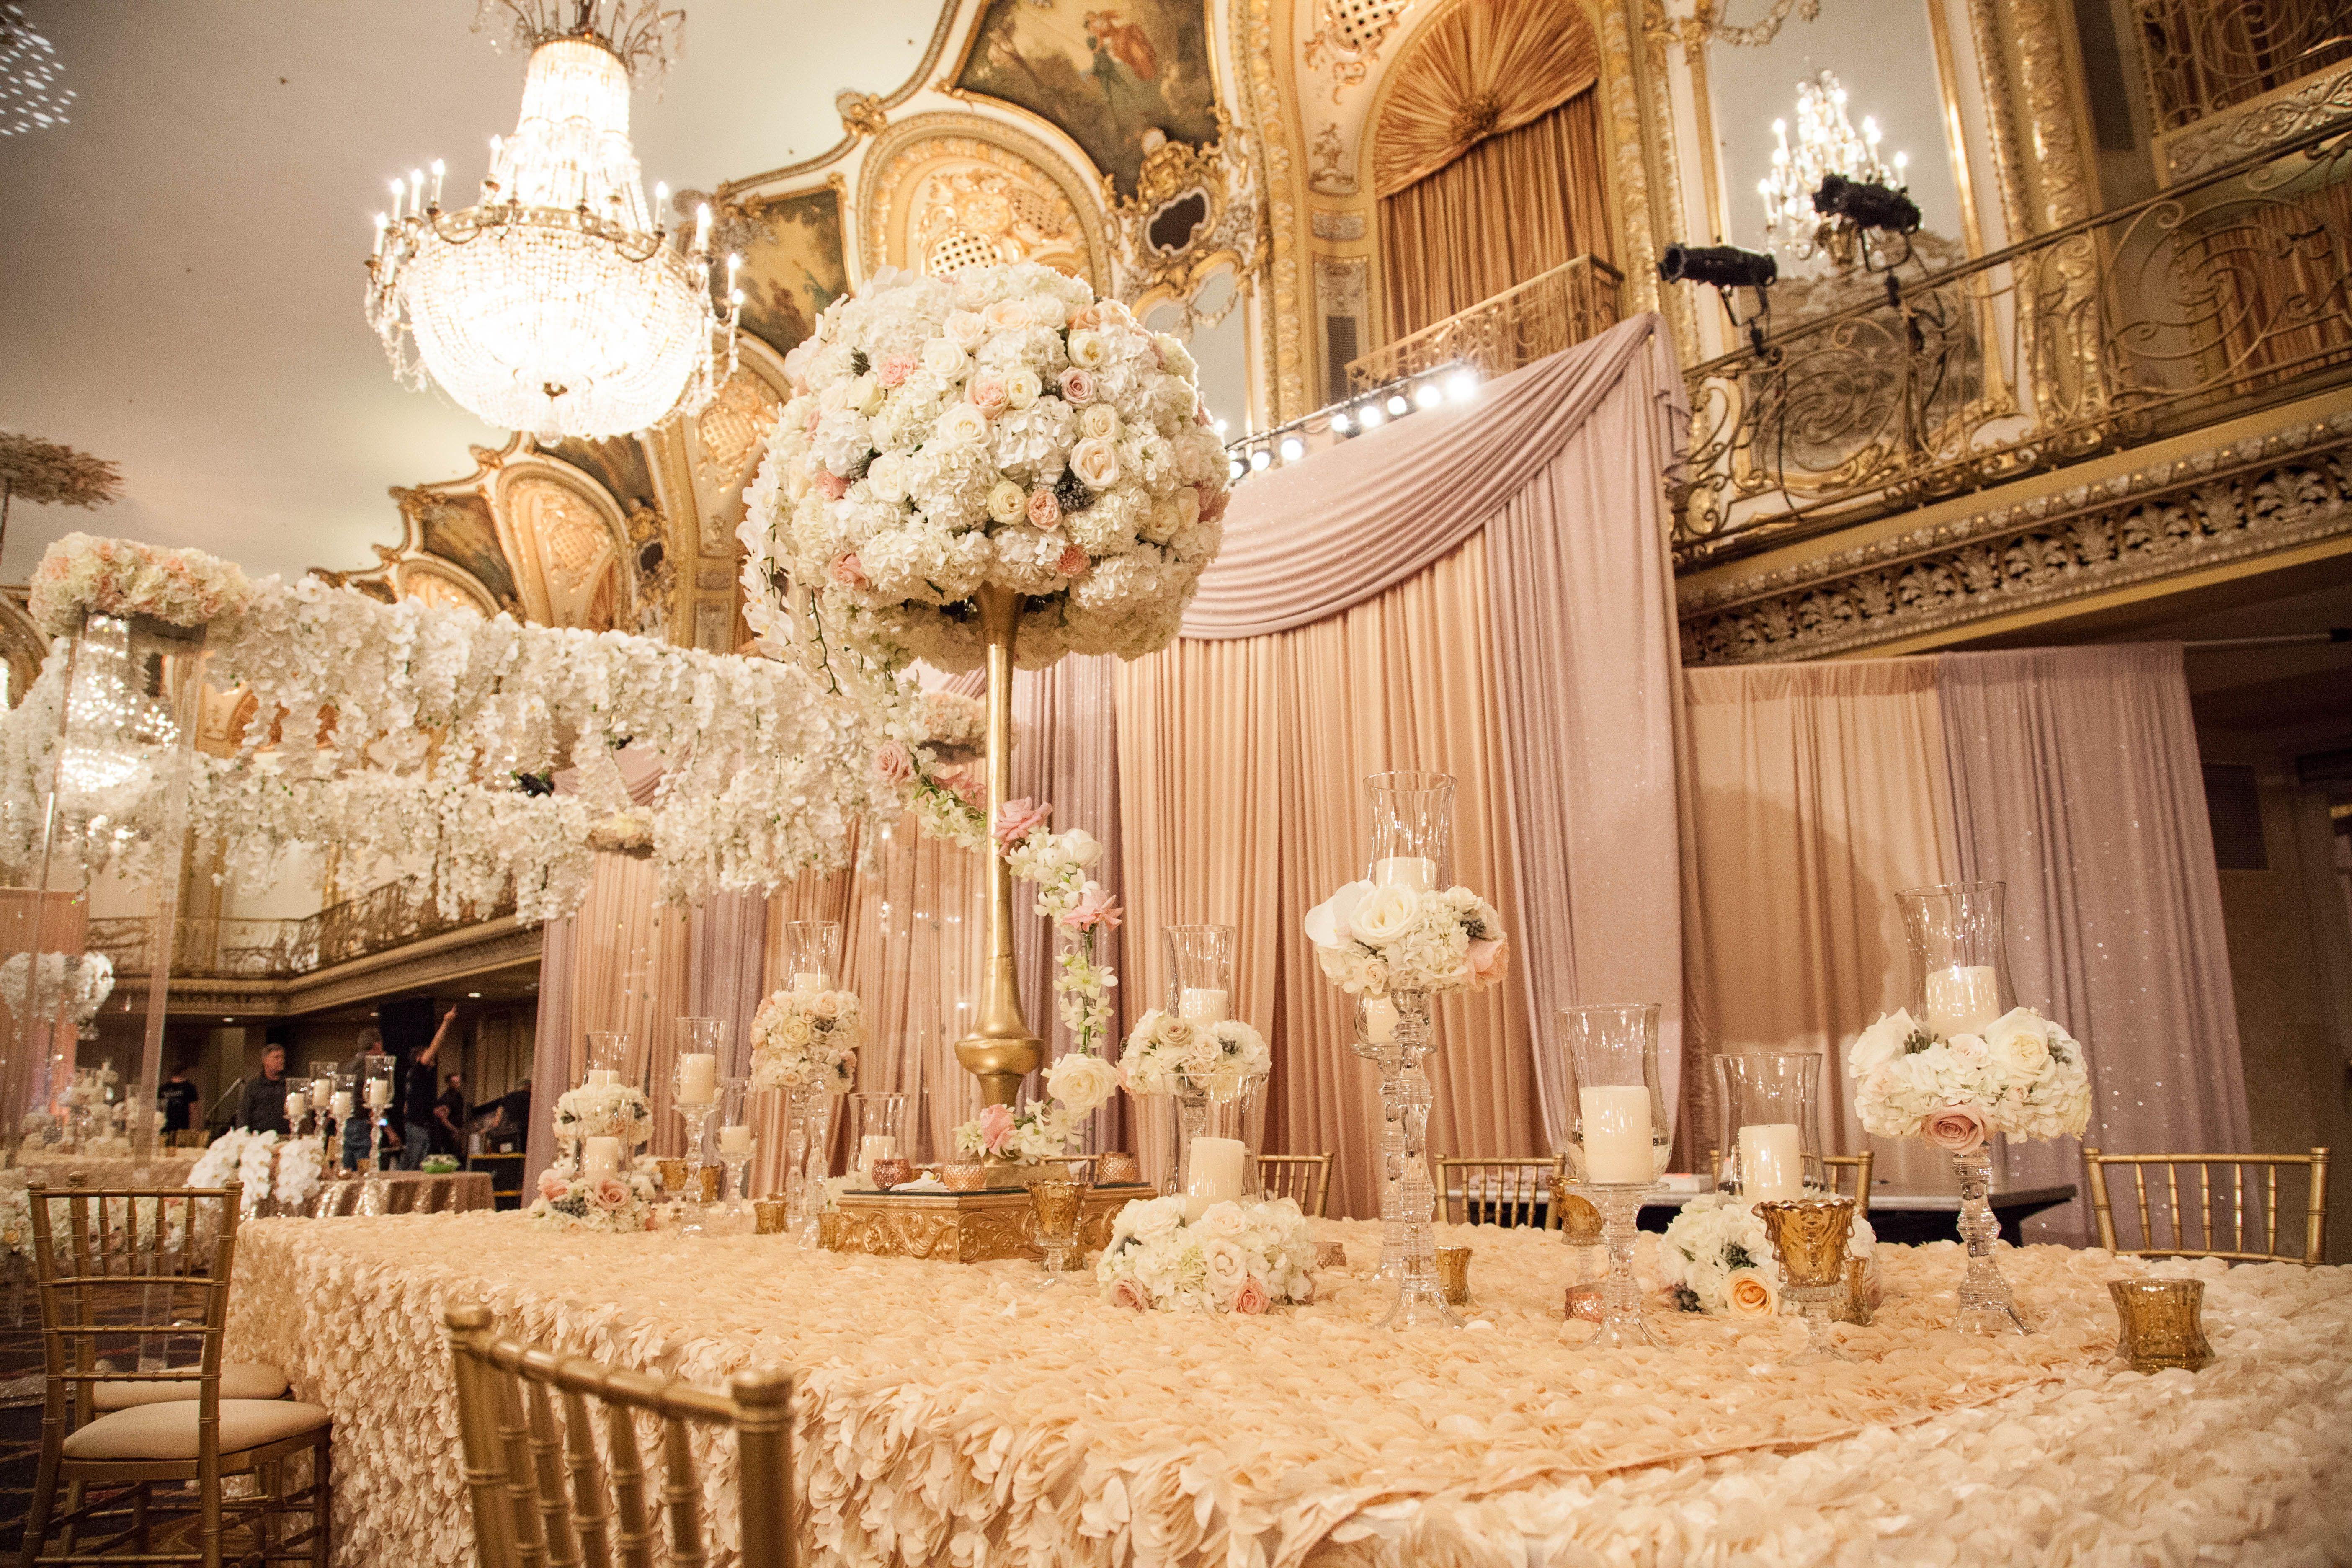 Glamorous Spring Wedding Posted By Yanni Design Studio Chicago Il Ballroom Wedding Design Studio Design Decor Design